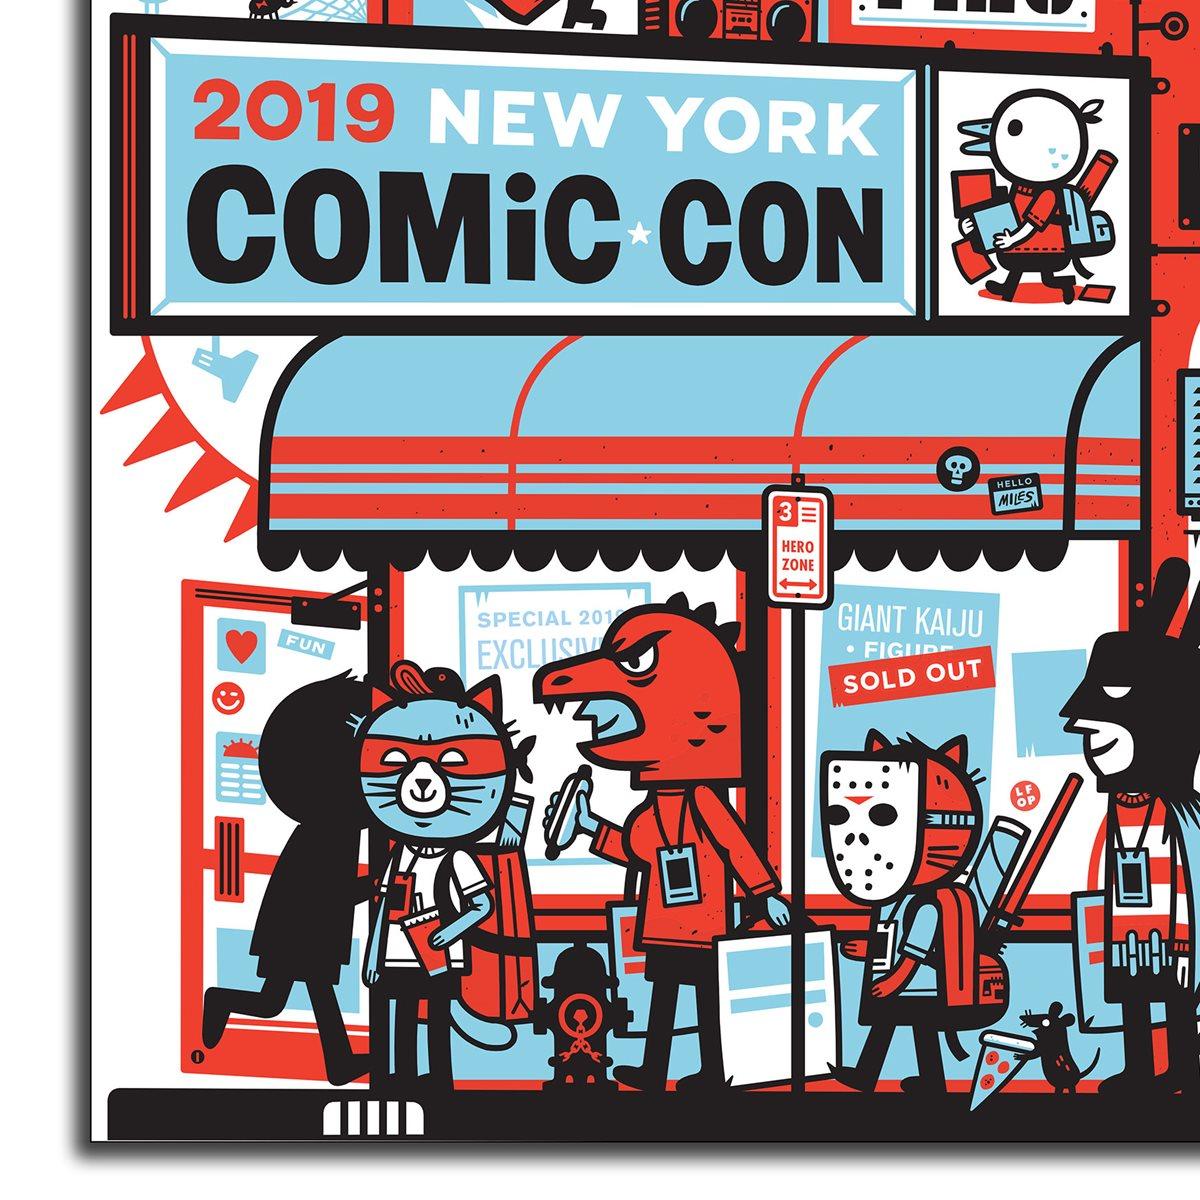 GLOW IN THE DARK SMART WALLET 2019 New York comic con exclusive RARE